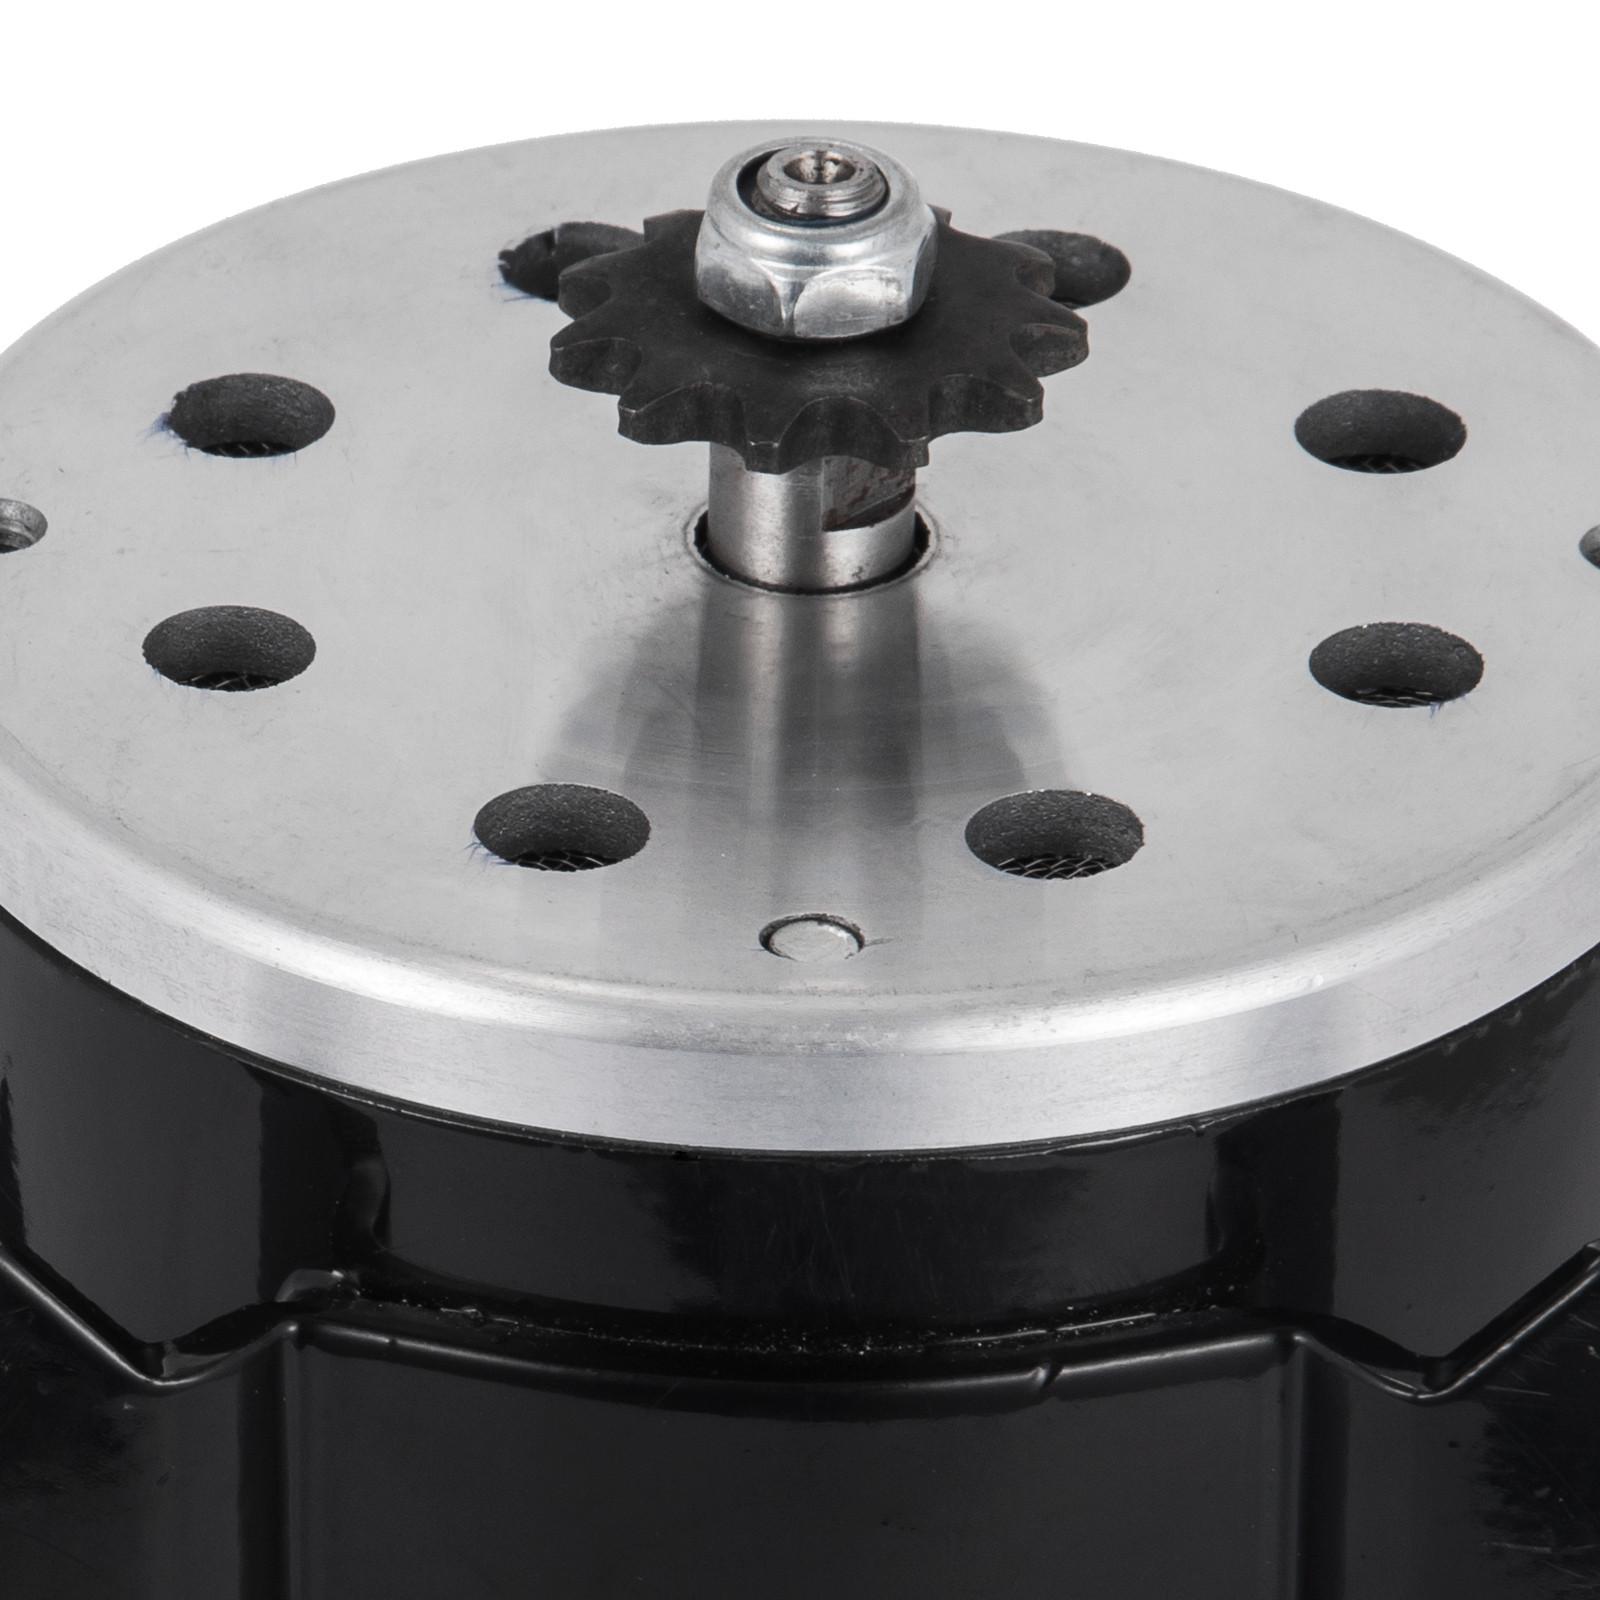 36v-Electric-Motor-controller-throttle-kit-f-Scooter-E-Scooter-ATV-Permanent thumbnail 93